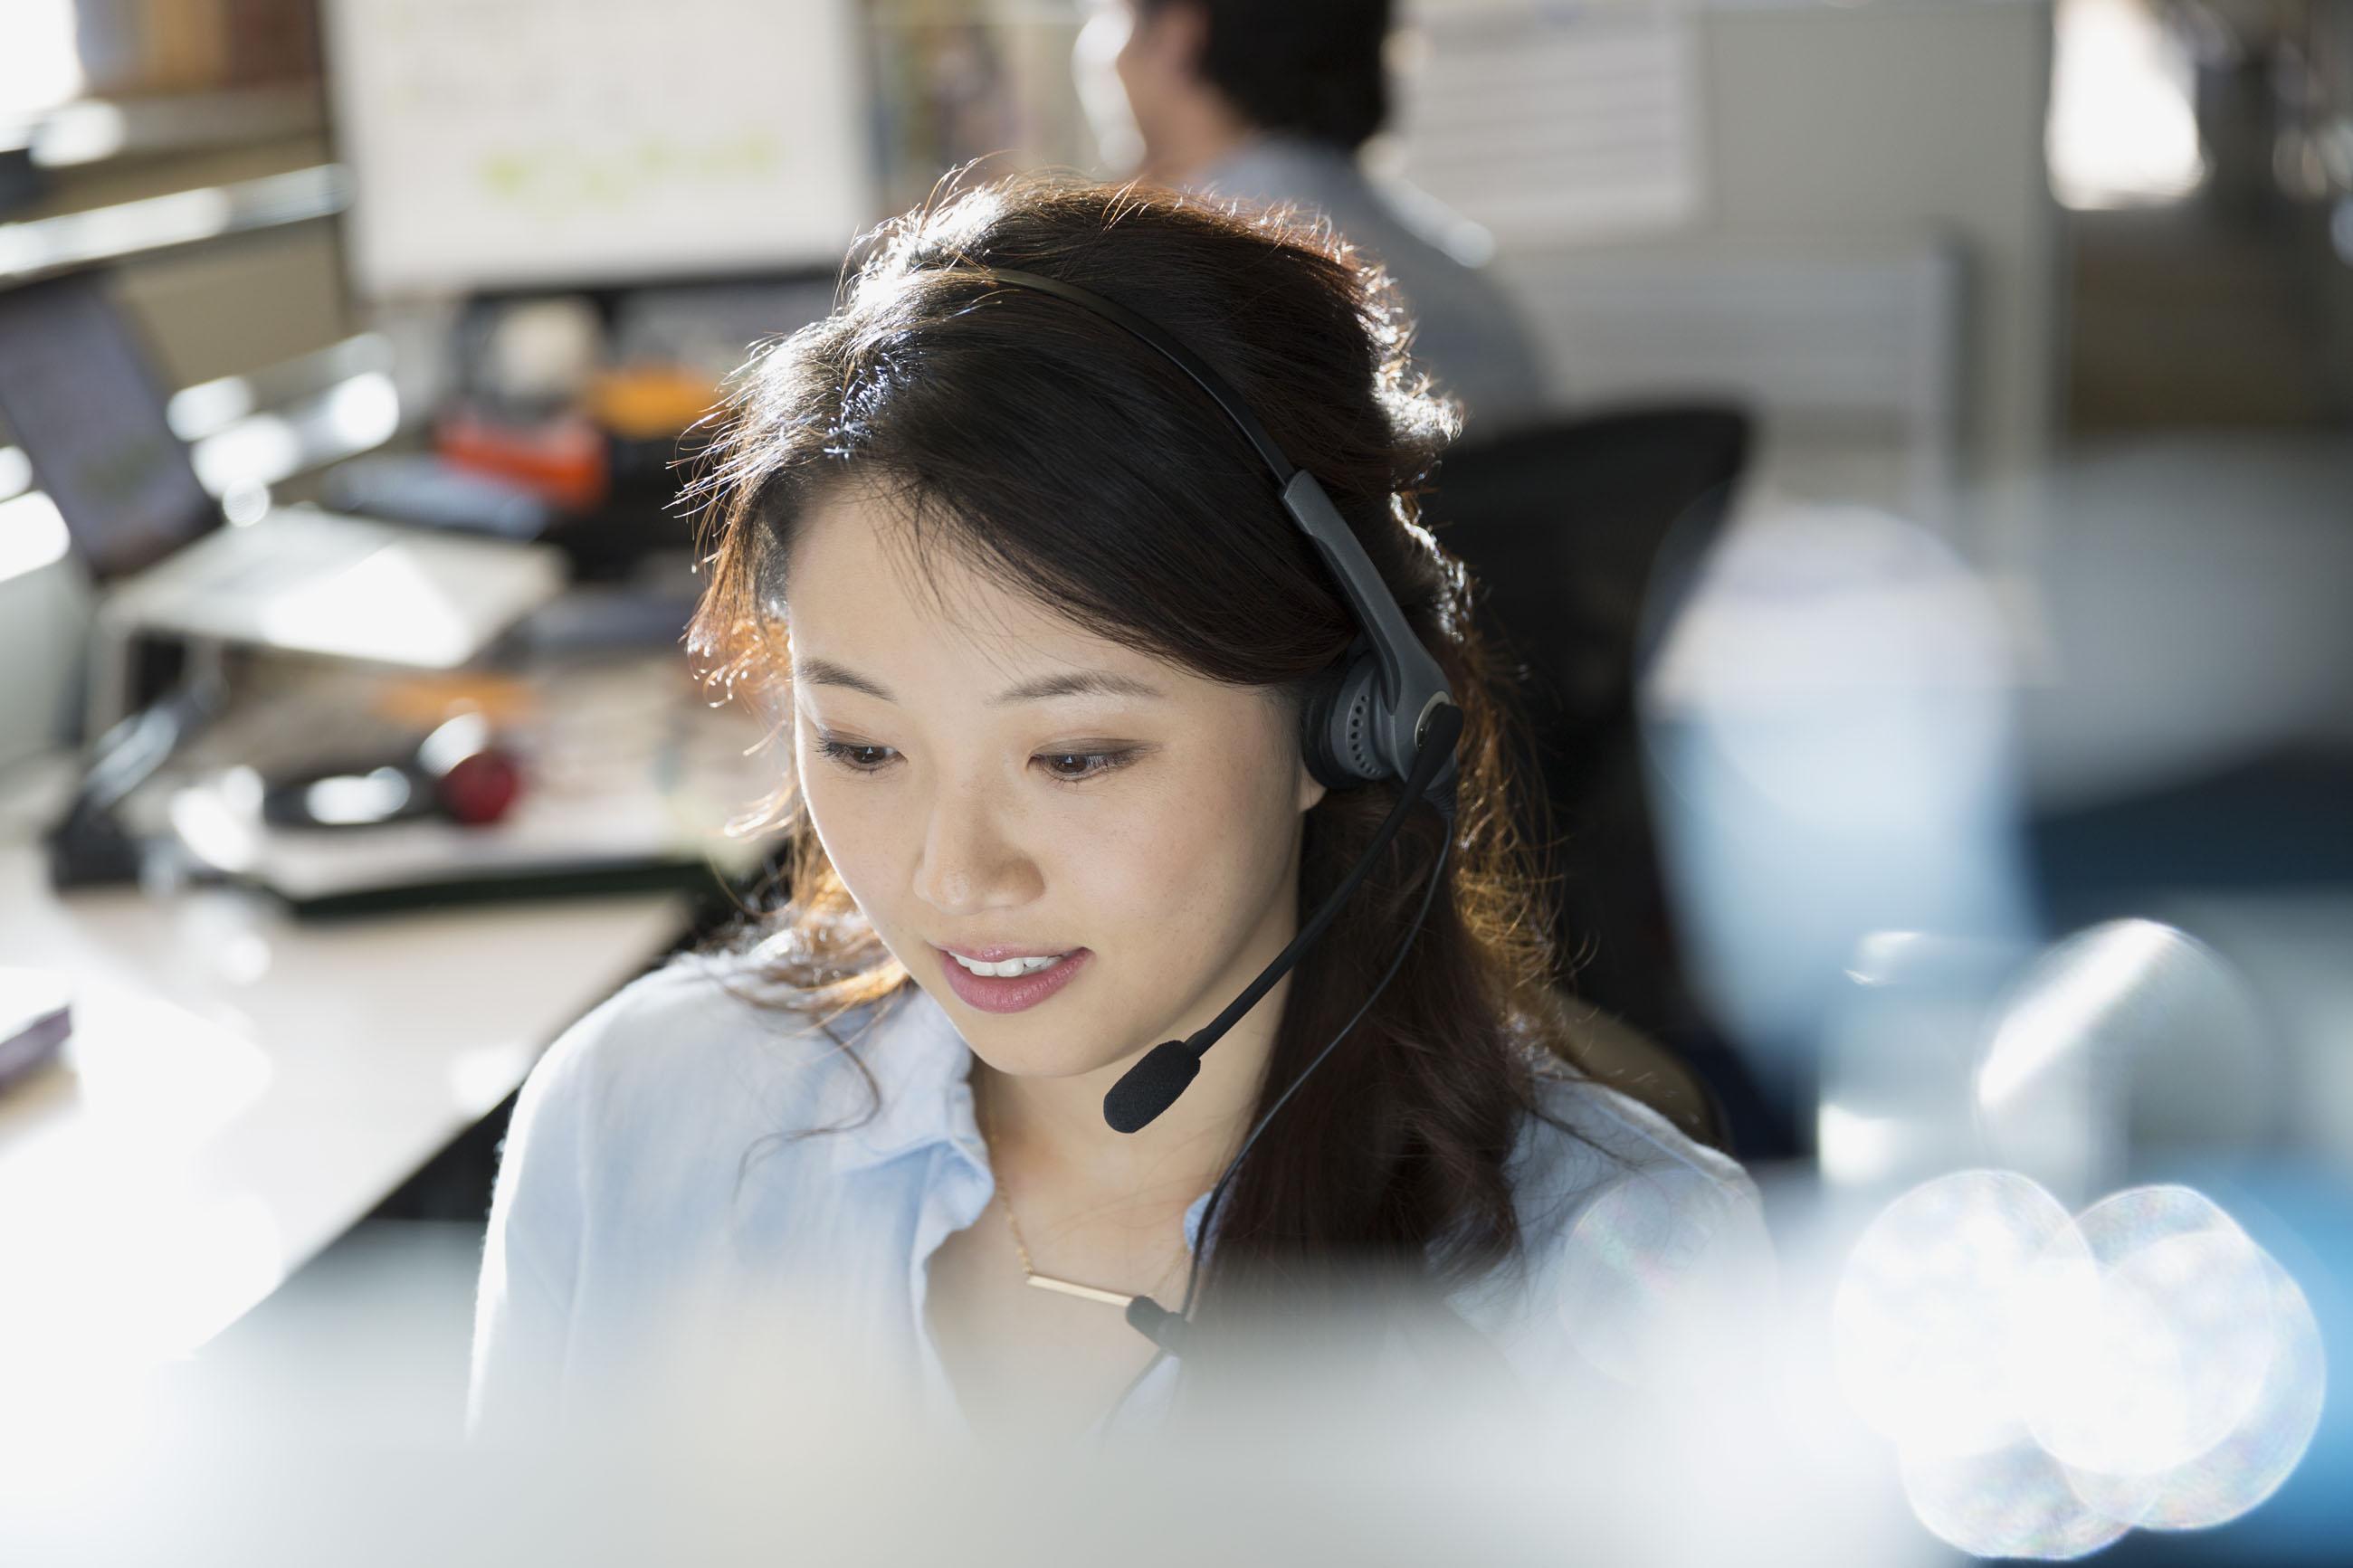 Enterprise Speech Recognition Startup Deepgram Raises $12M